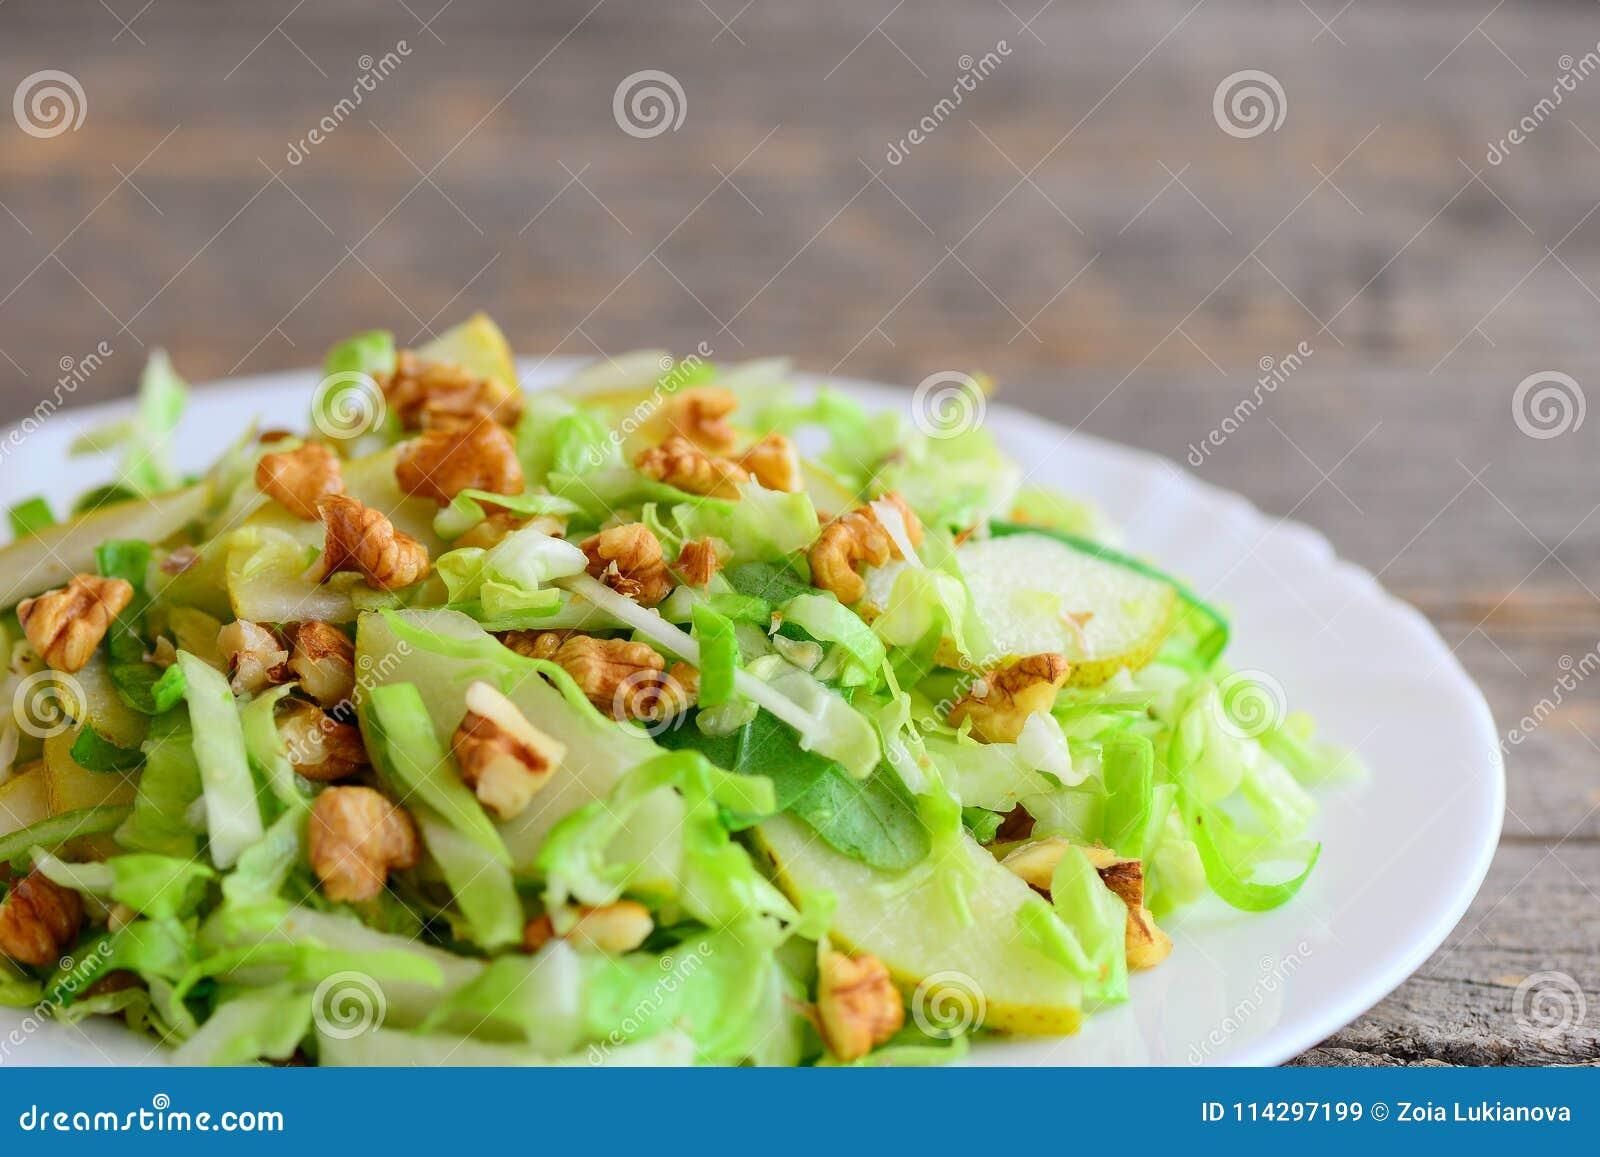 Einfacher cäsar